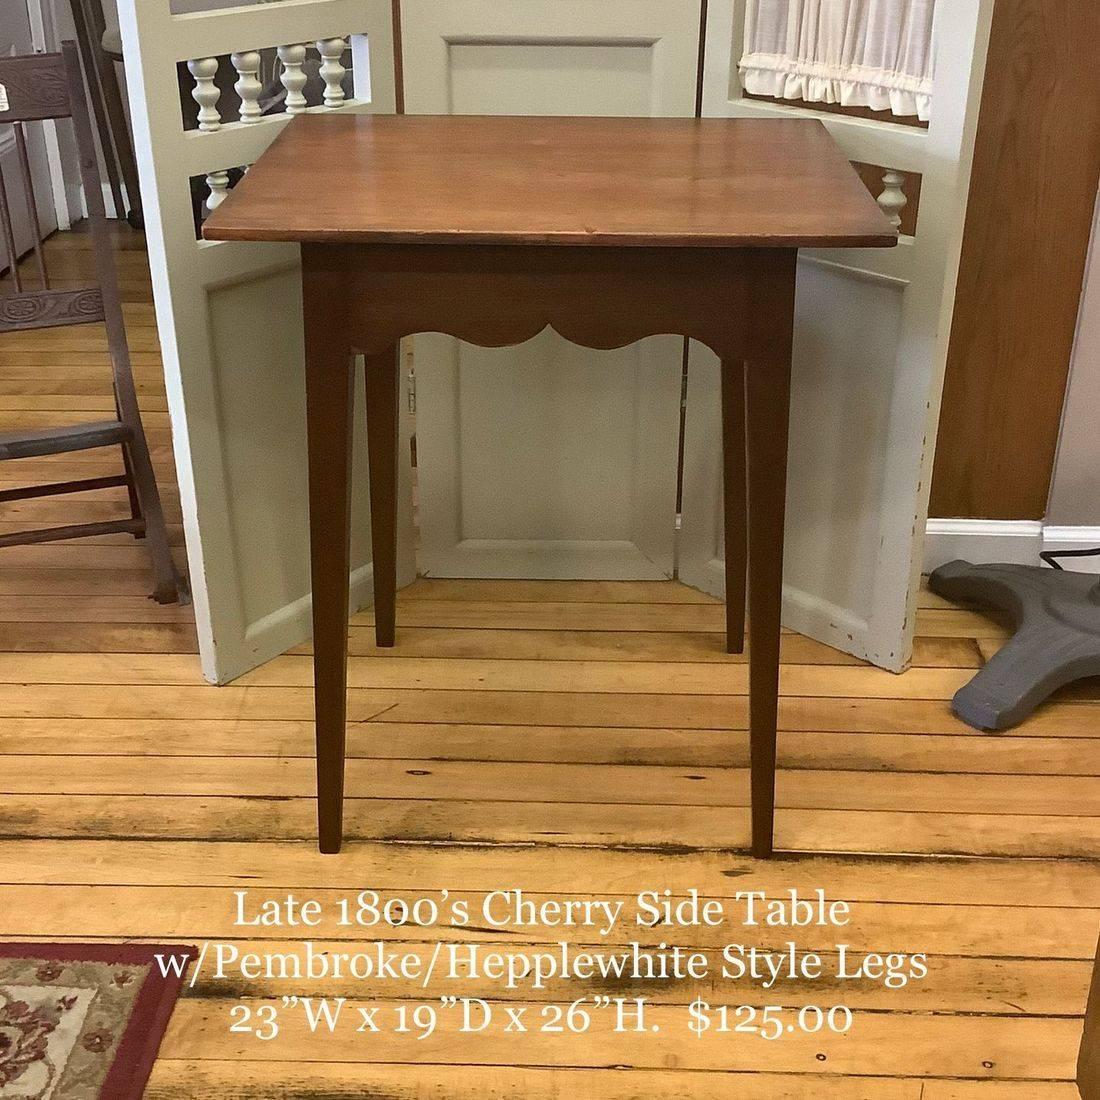 Late 1800's Cherry Side Table w/Pembroke/Hepplewhite Style Legs   $125.00